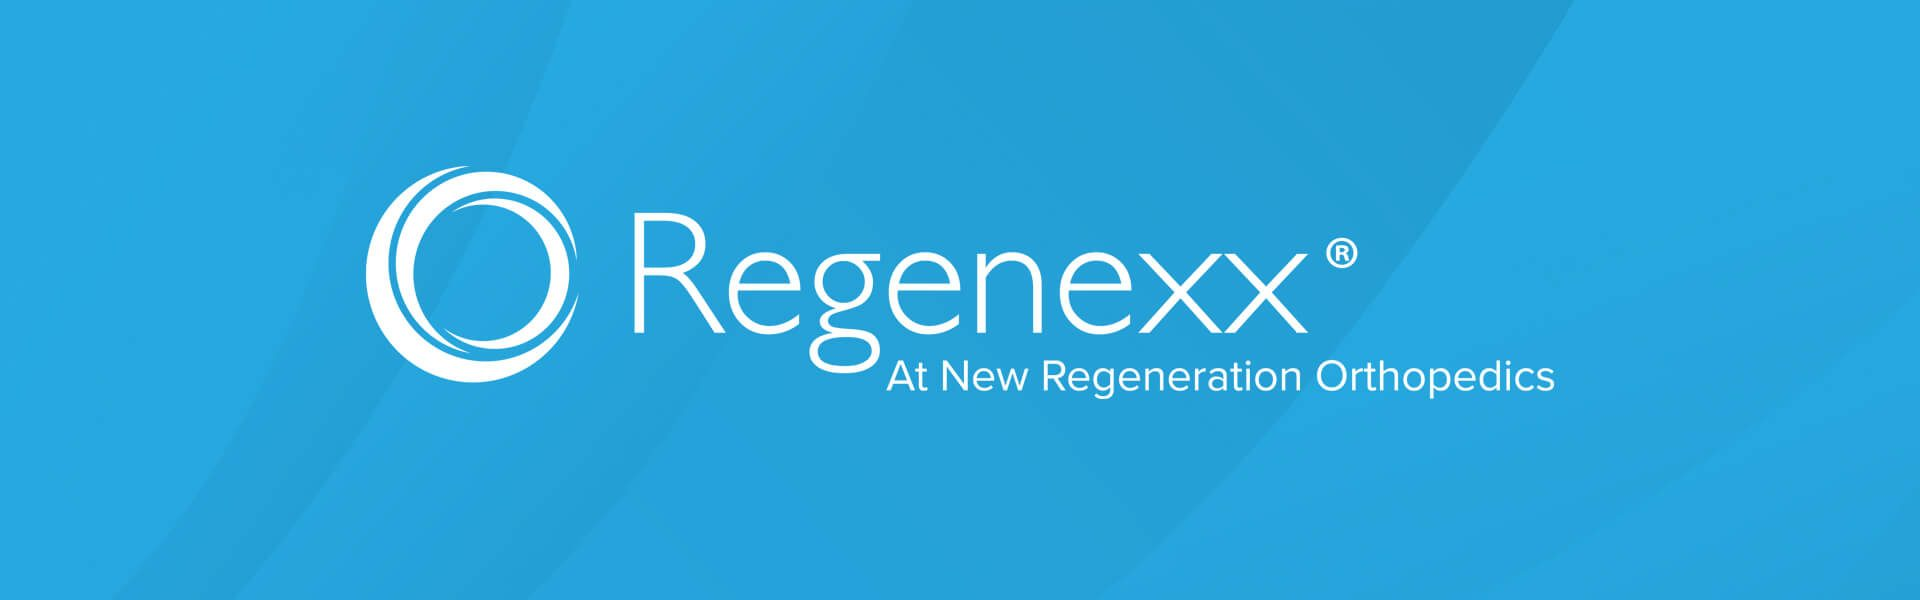 regenexx-at-new-regeneration-orthopedics-2